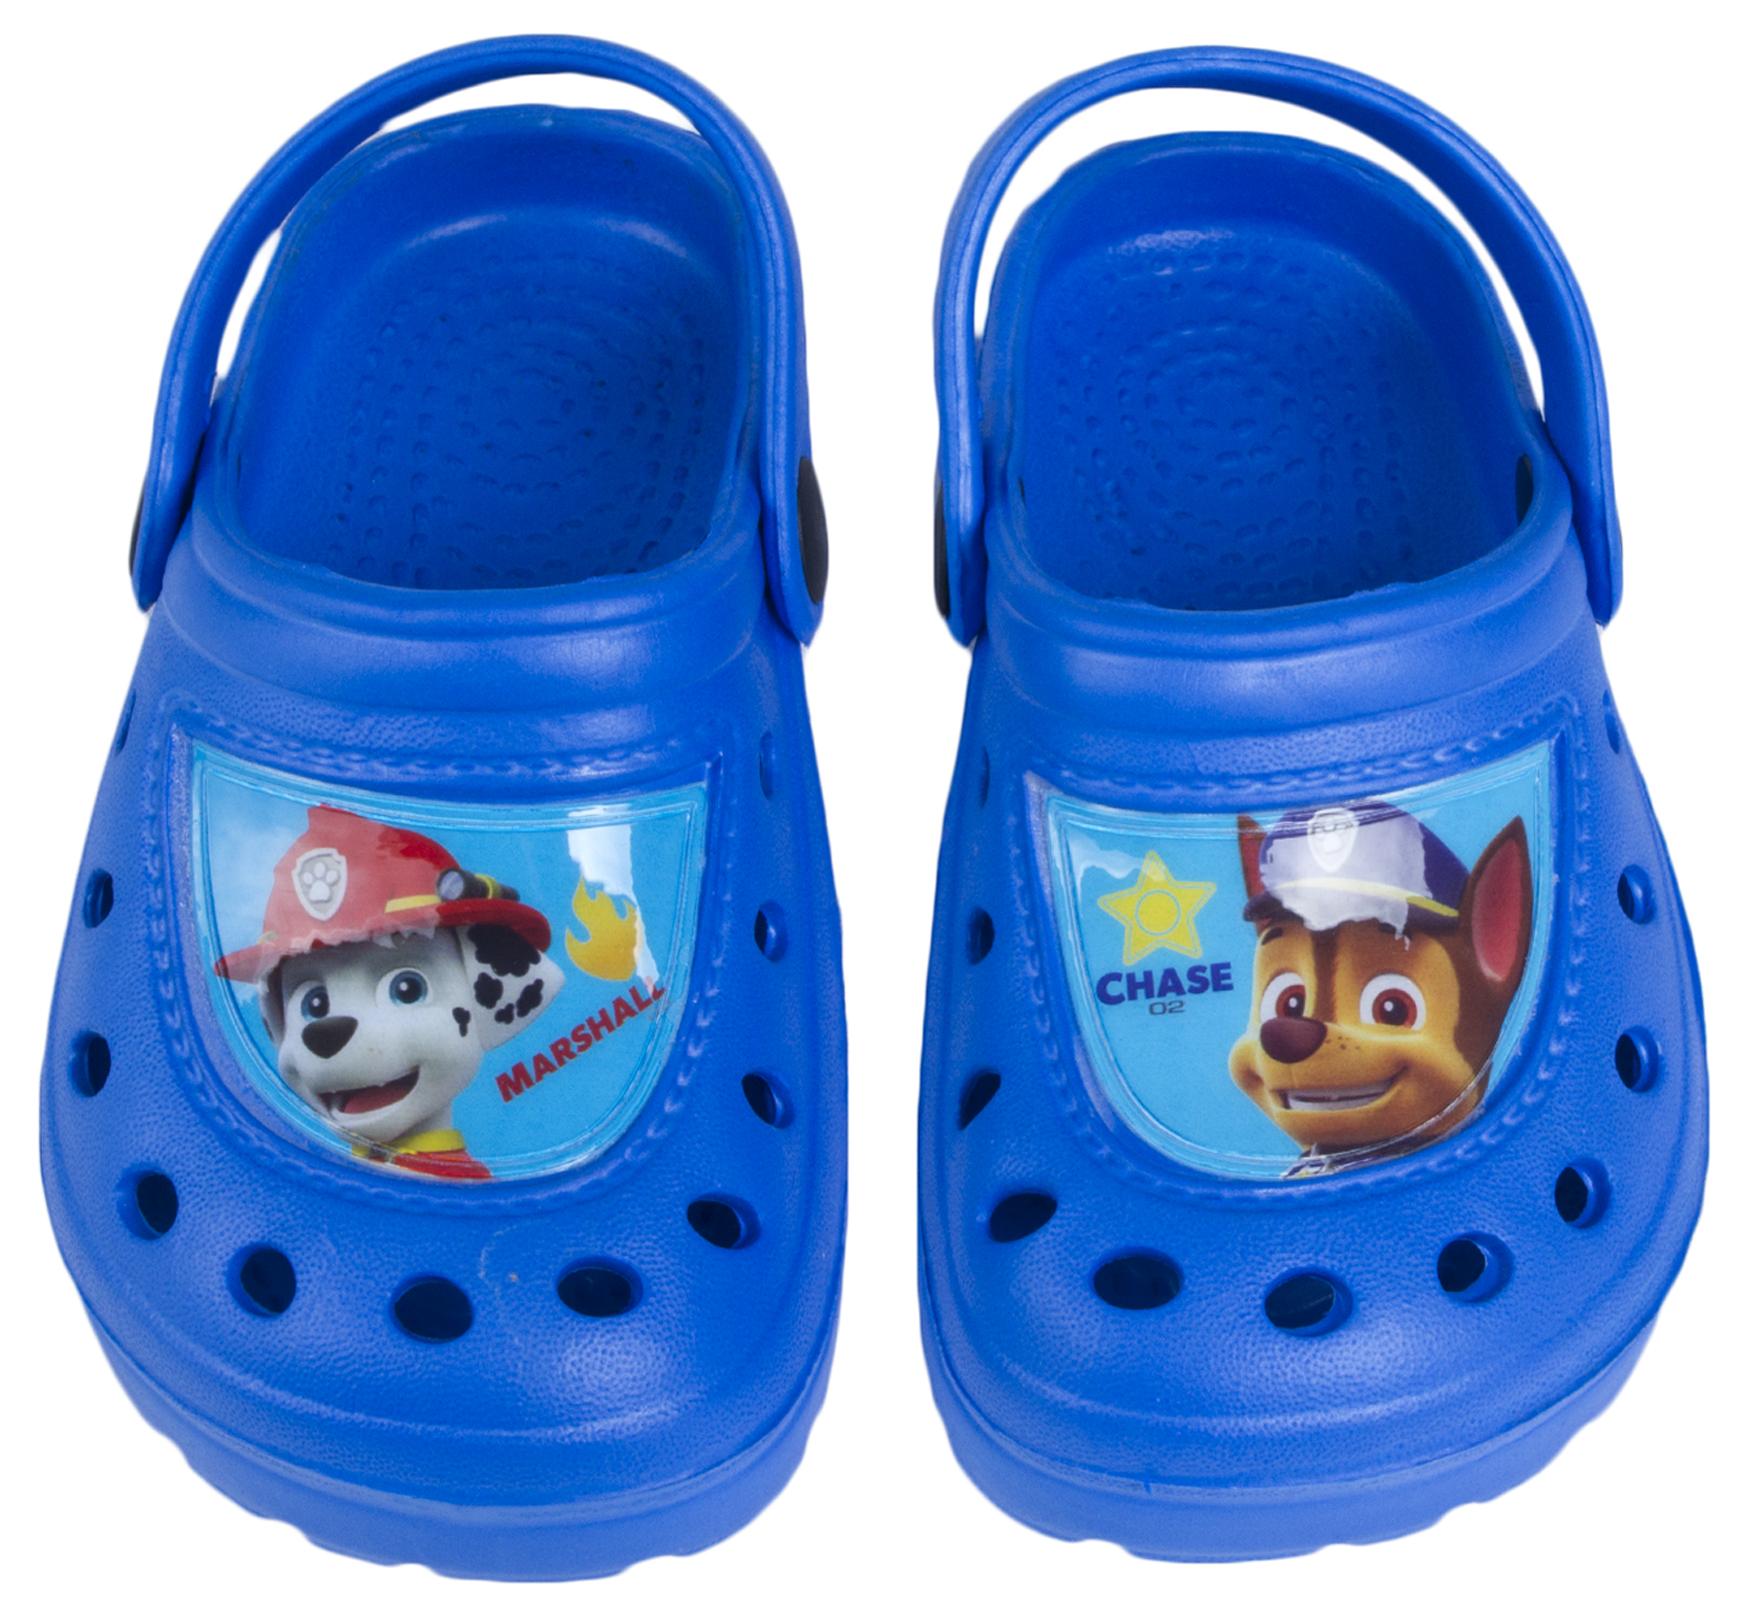 Paw Patrol Clogs Boys Girls Beach Sandals Flat Shoes Mules Kids Chase Skye Size